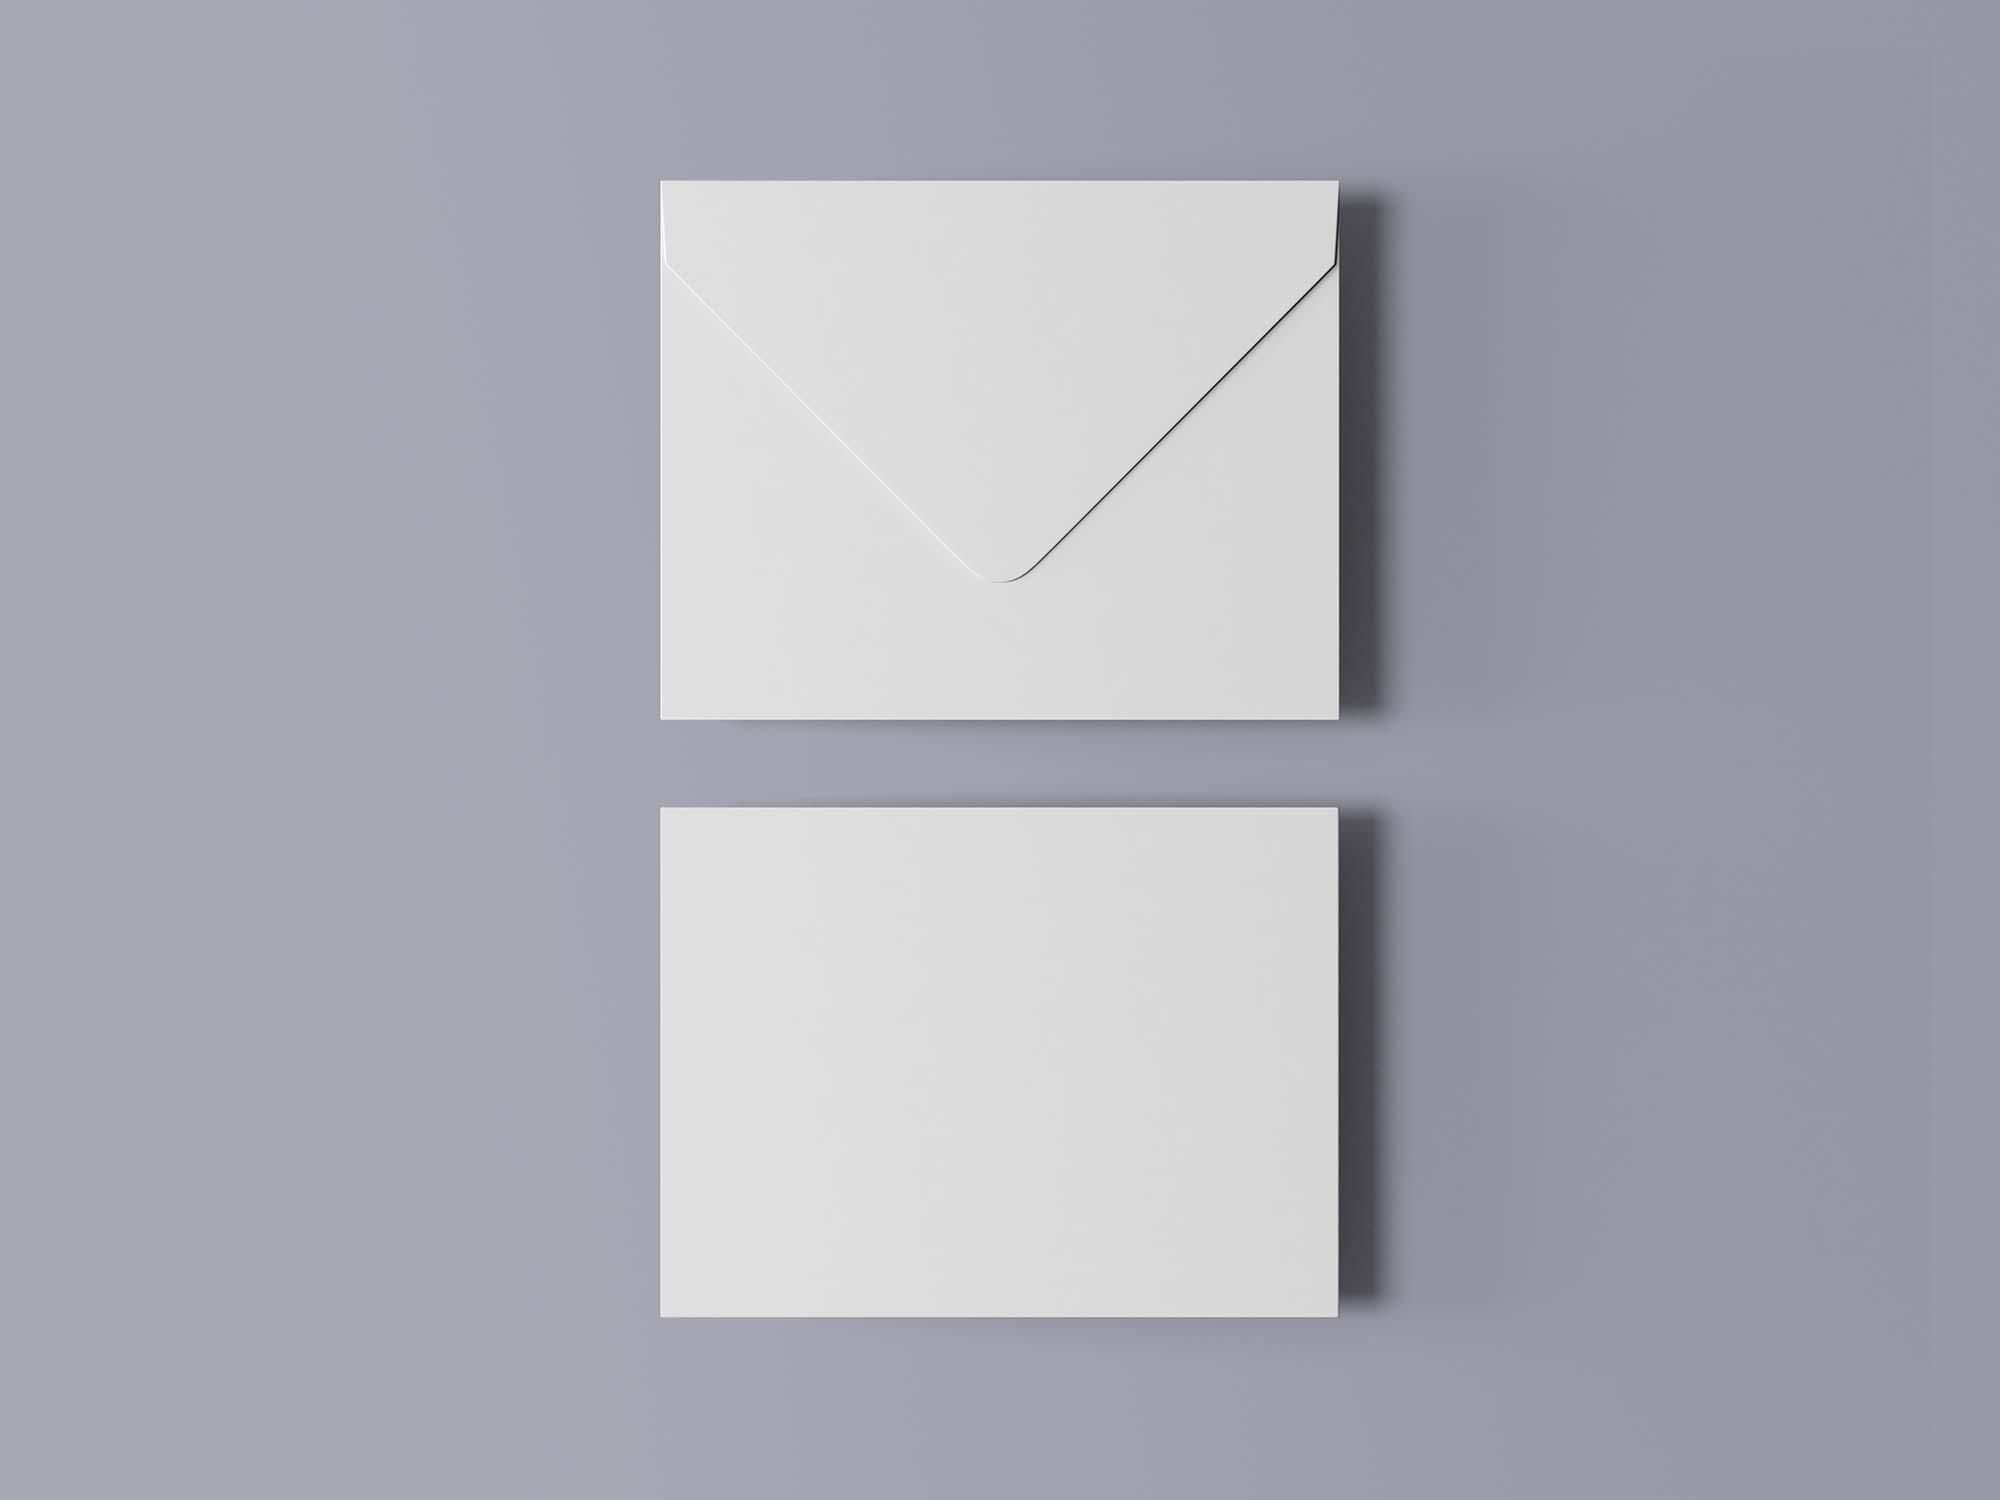 Greeting Card with Envelope Mockup 2